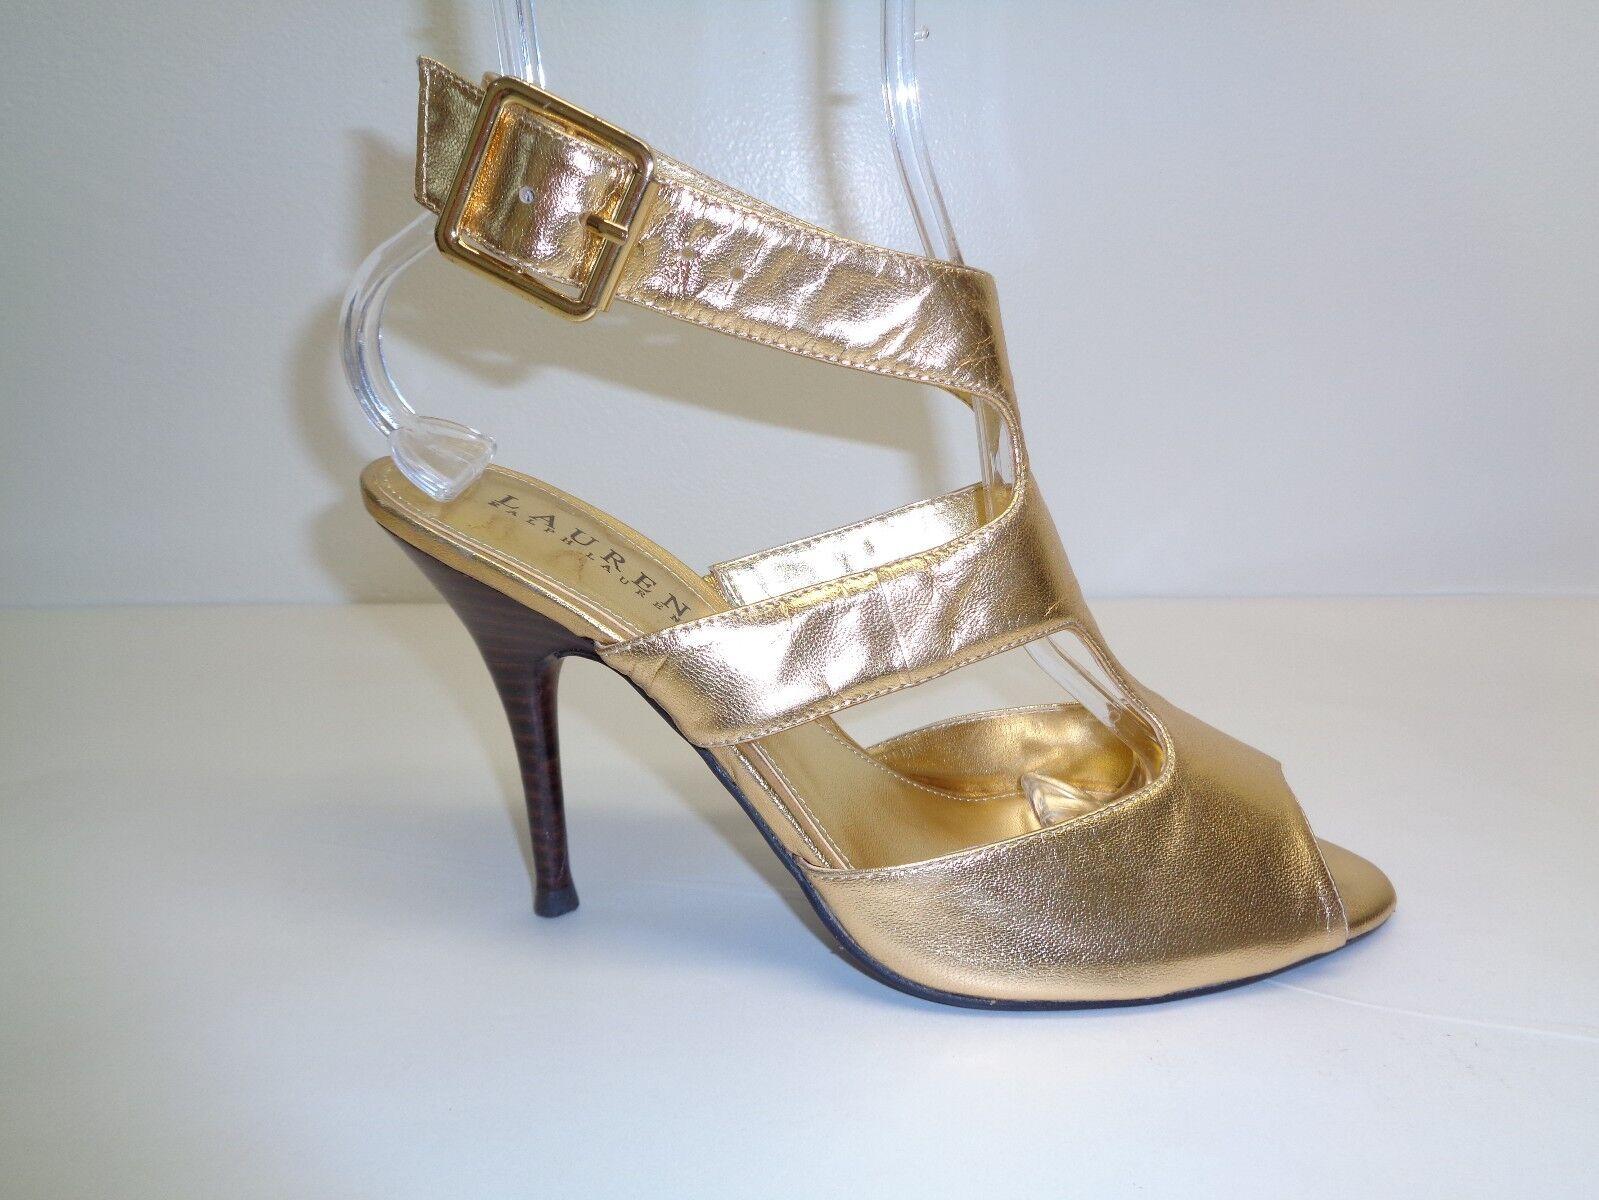 Ralph Lauren Size 8.5 M BAIRD Gold Leather T-Strap Sandals New Donna Shoes